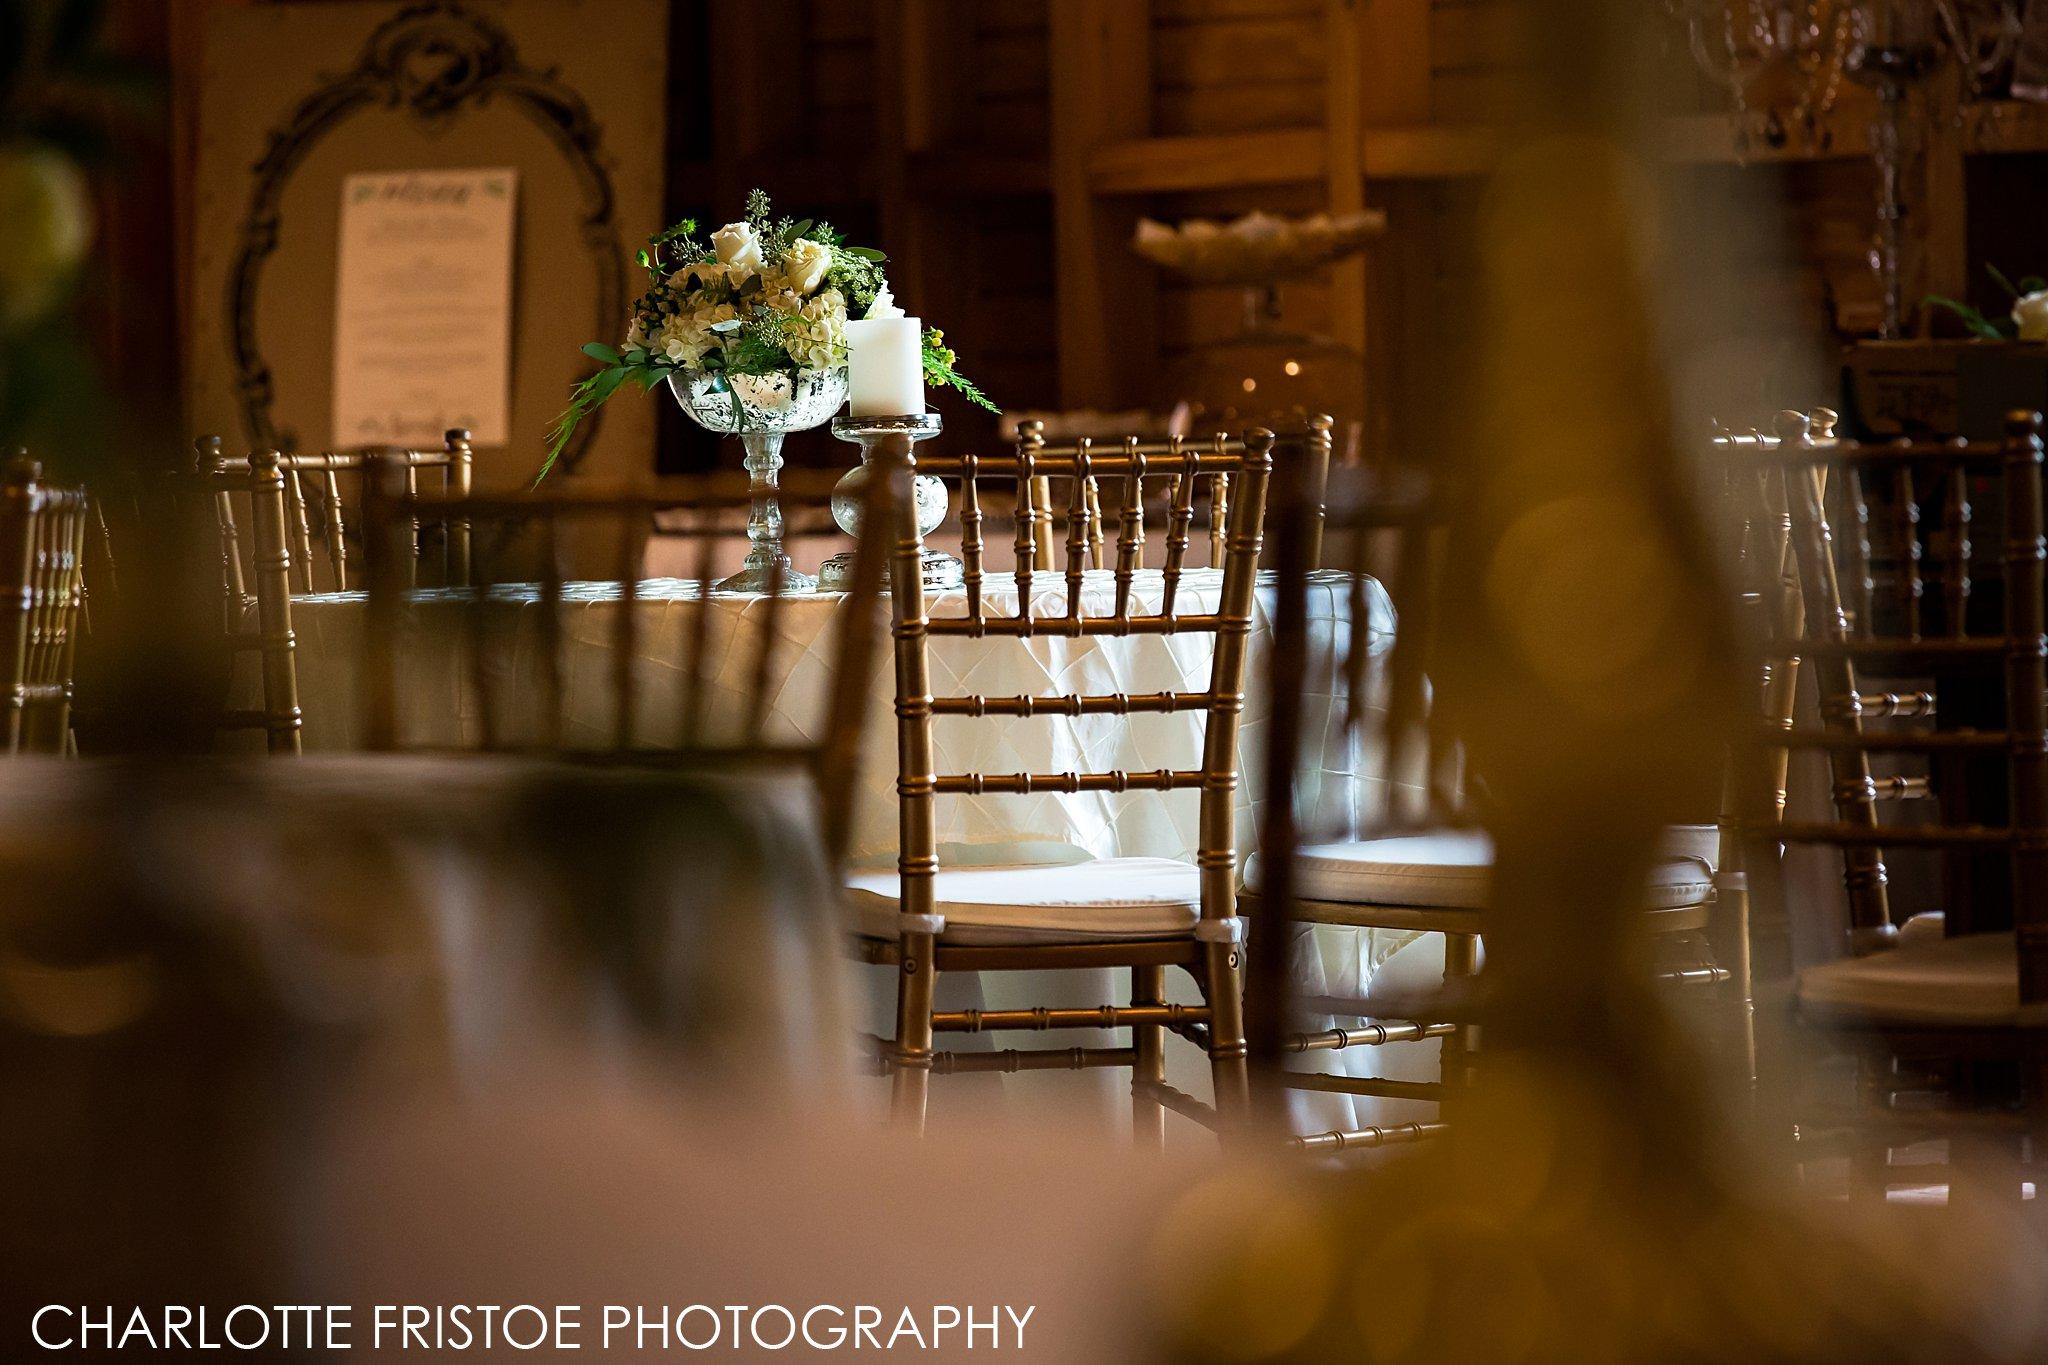 Charlotte Fristoe Photography Blog-5.jpg